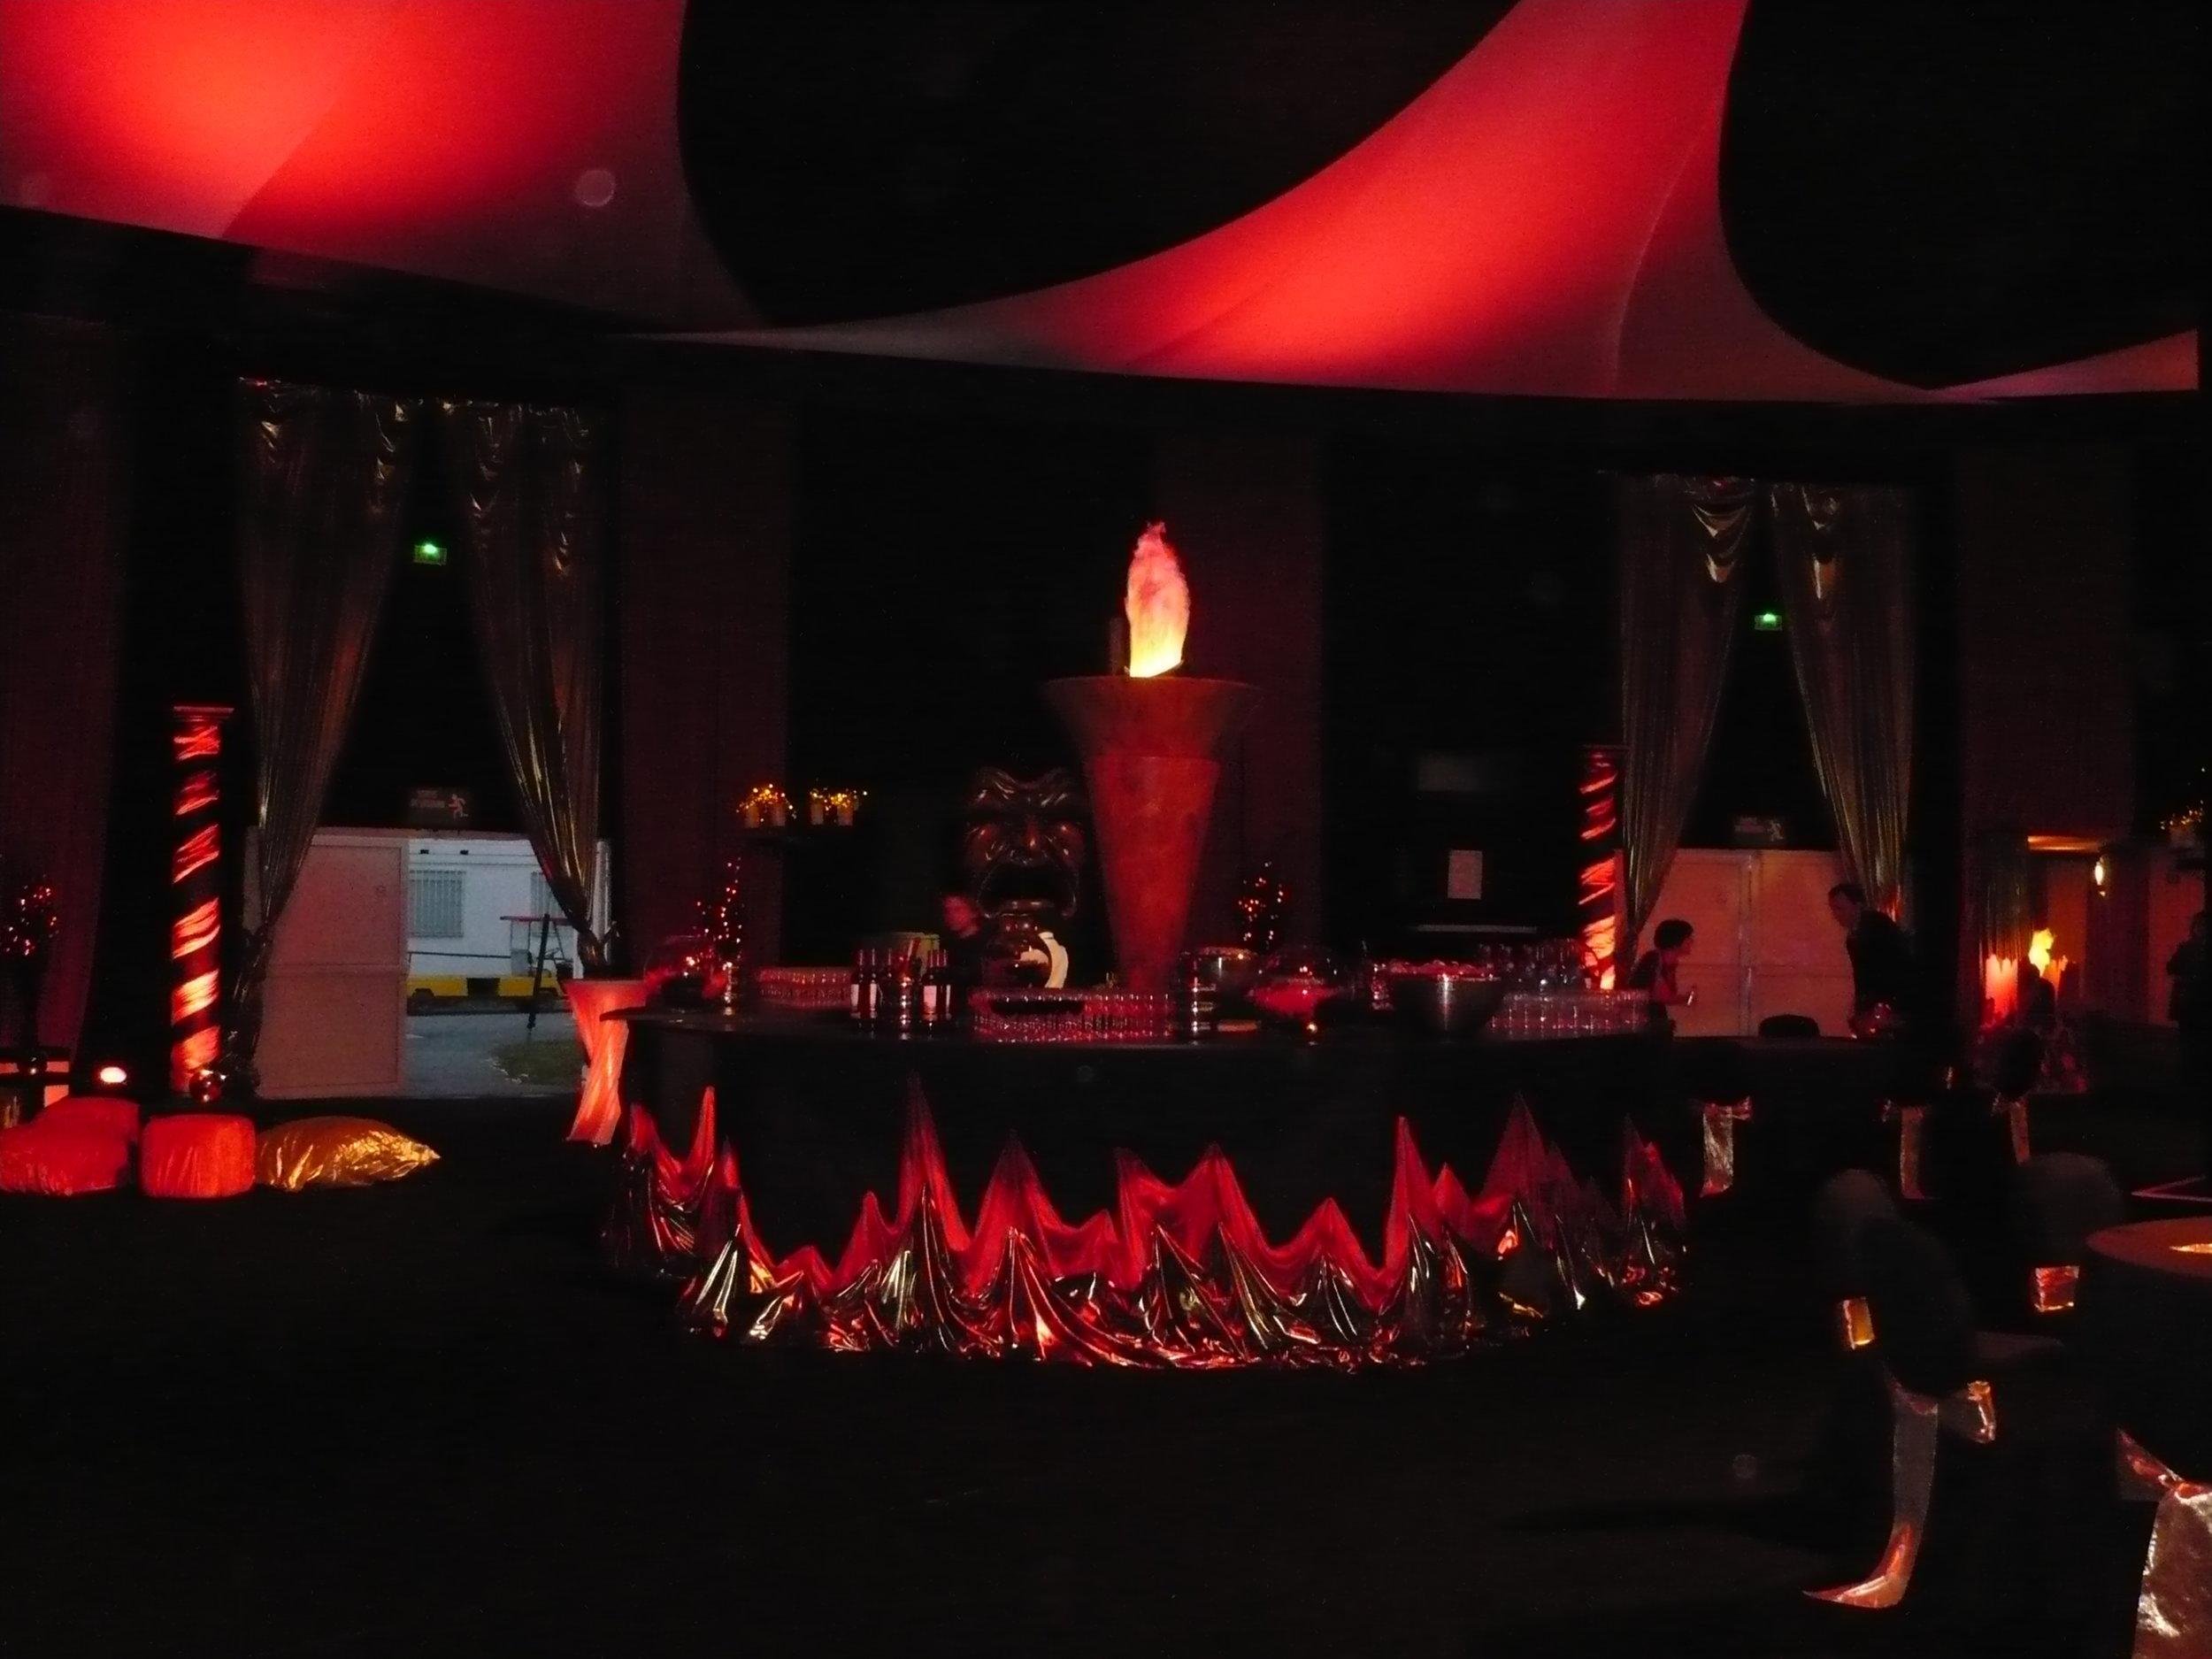 hell-theme-networking-gala-dinner.JPG